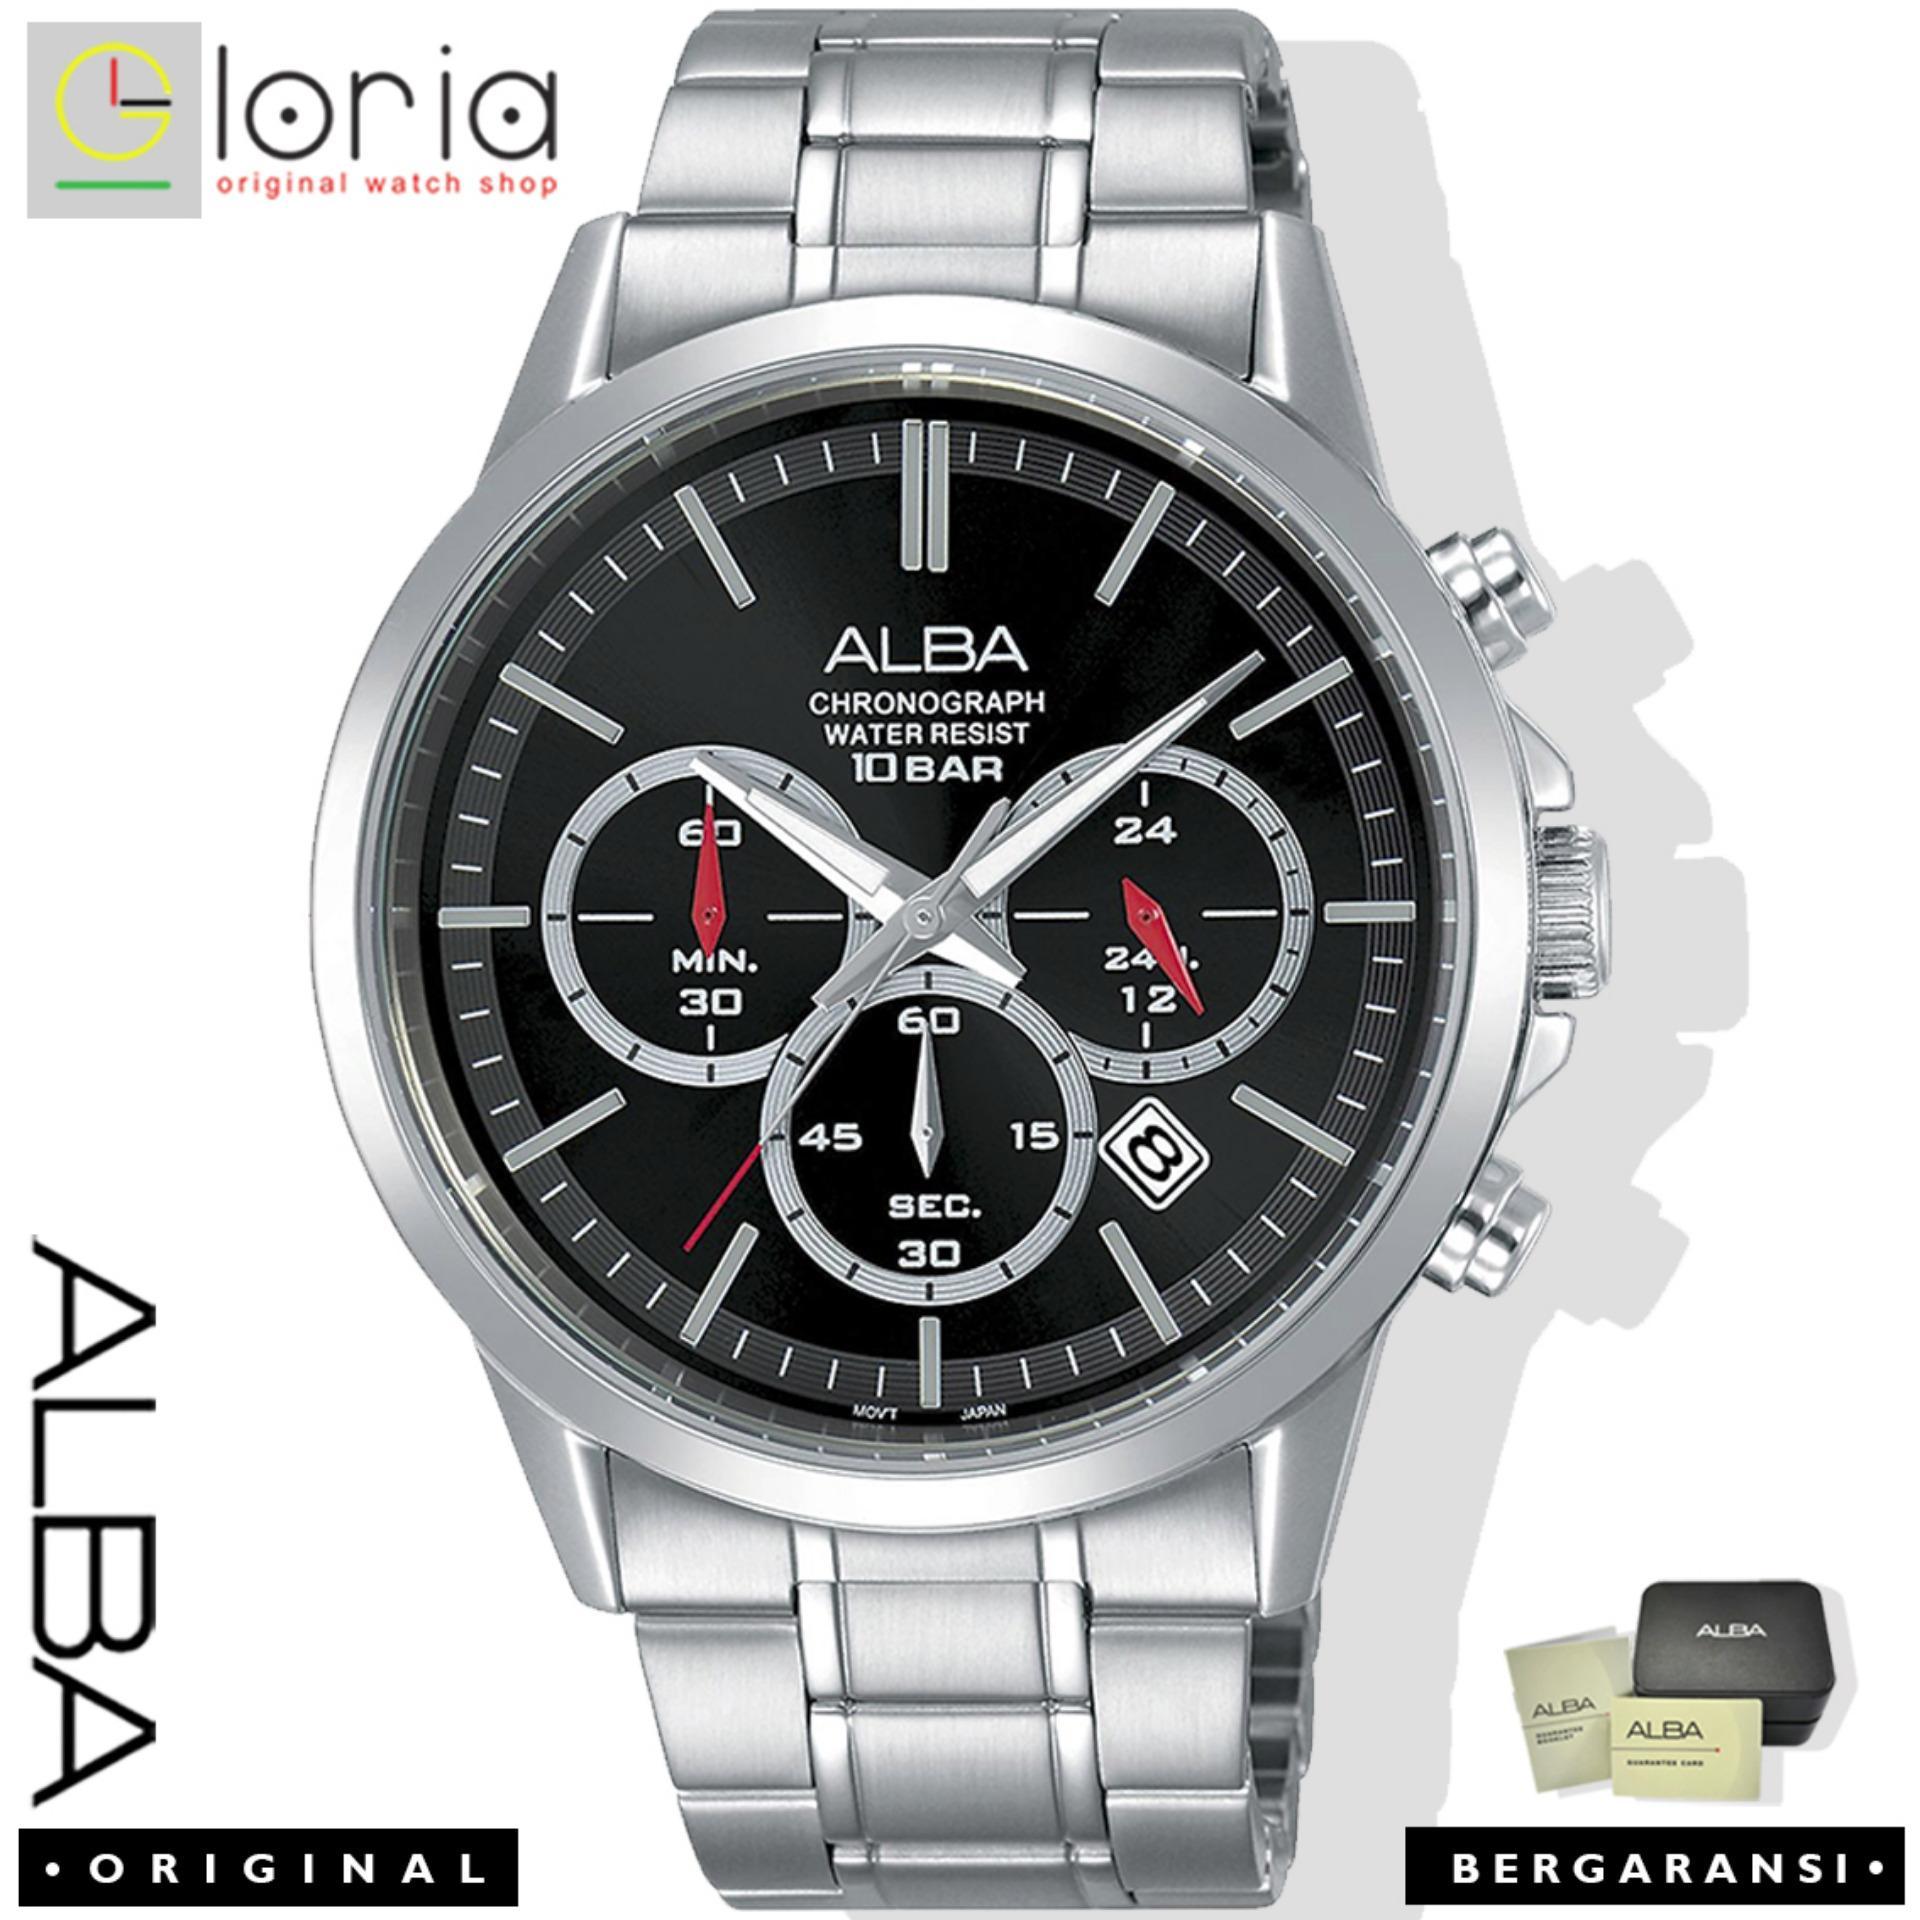 ALBA AT3B Series Chronograph Jam Tangan Pria  Quartz Movement Tali Rantai Stainless Steel